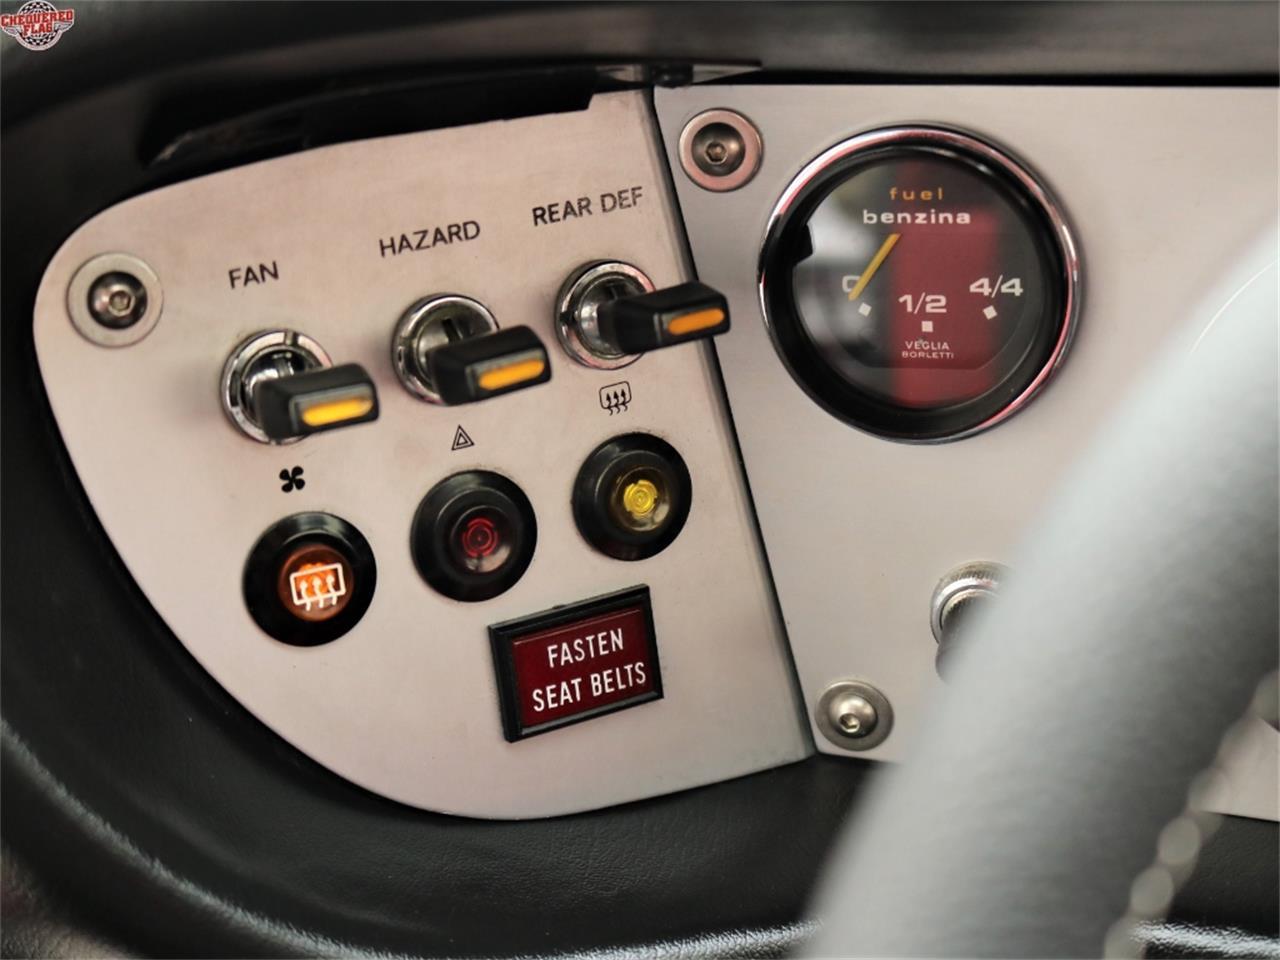 Large Picture of 1975 Ferrari 308 located in Marina Del Rey California - $79,500.00 - L812